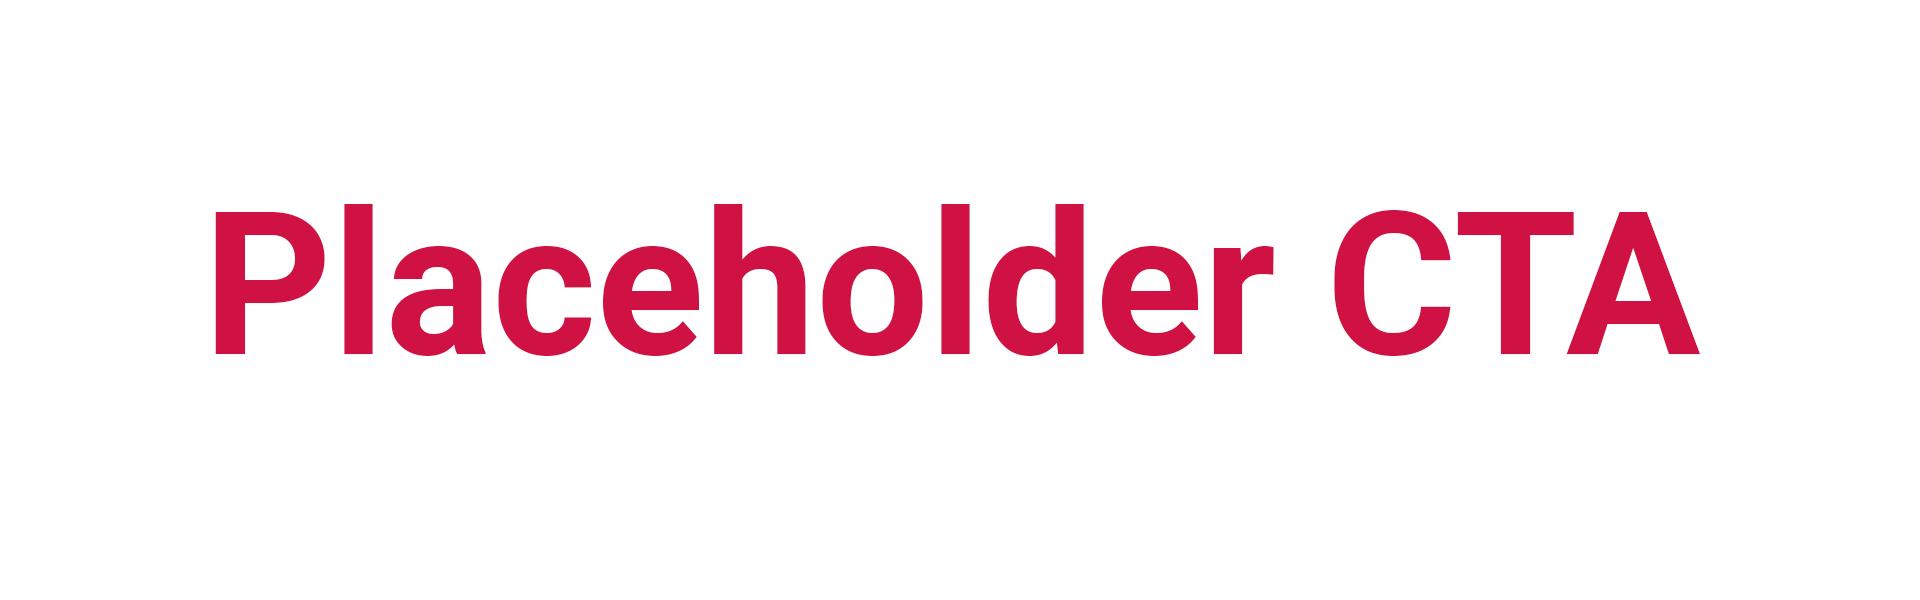 placeholder-cta